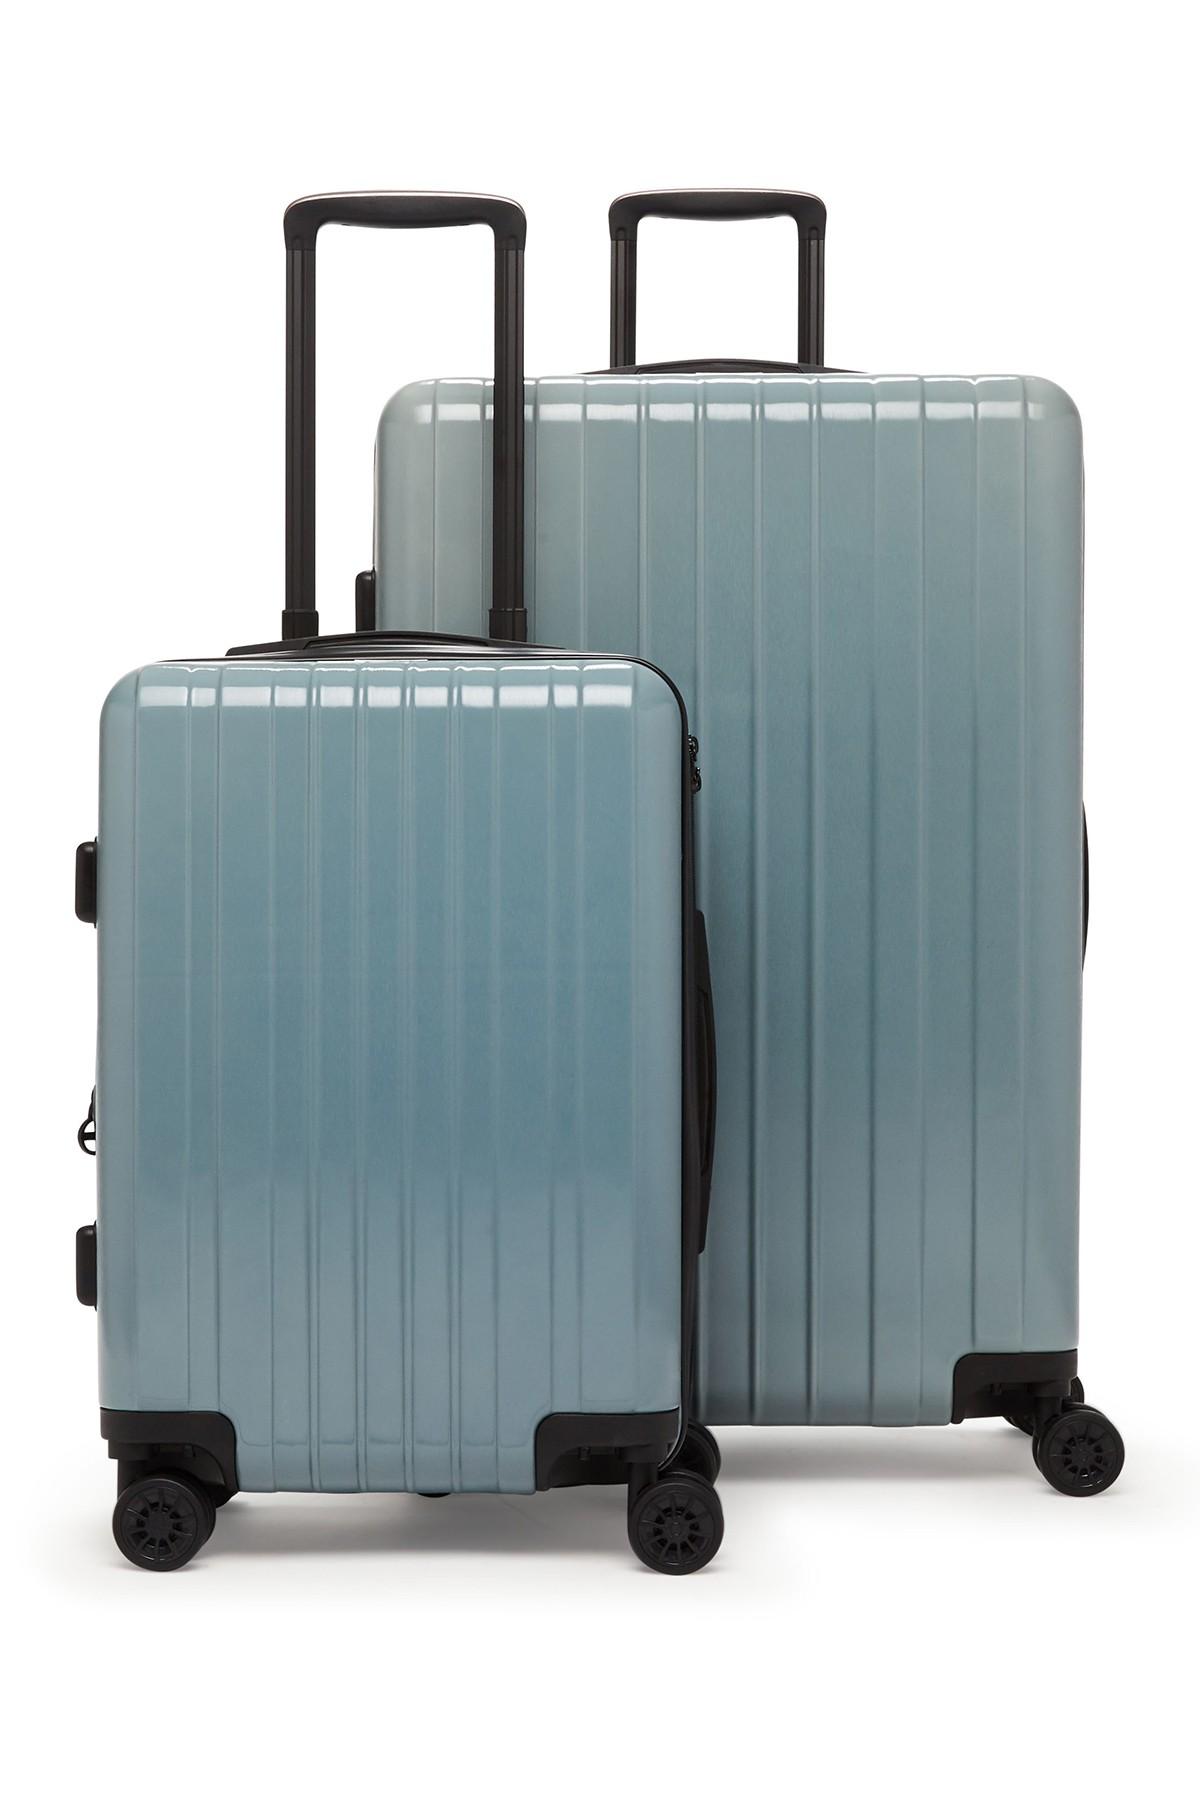 calpak luggage maie 2 piece hardside